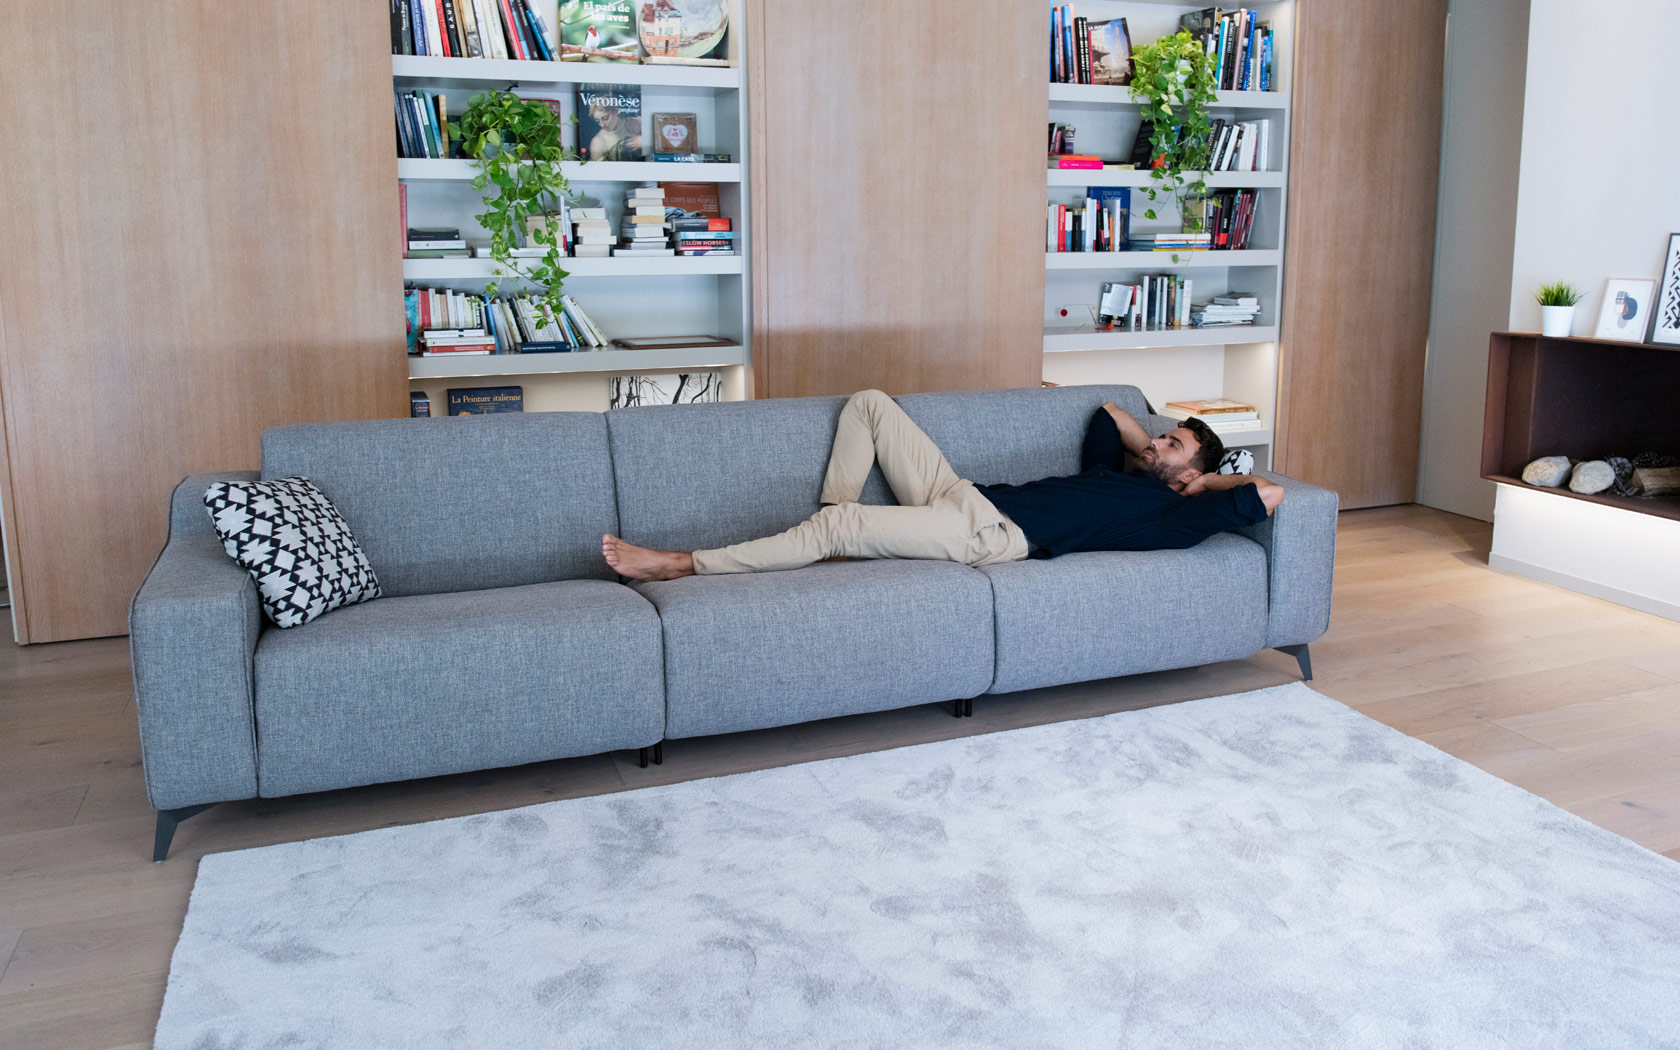 Atlanta sofa relax 2020 11